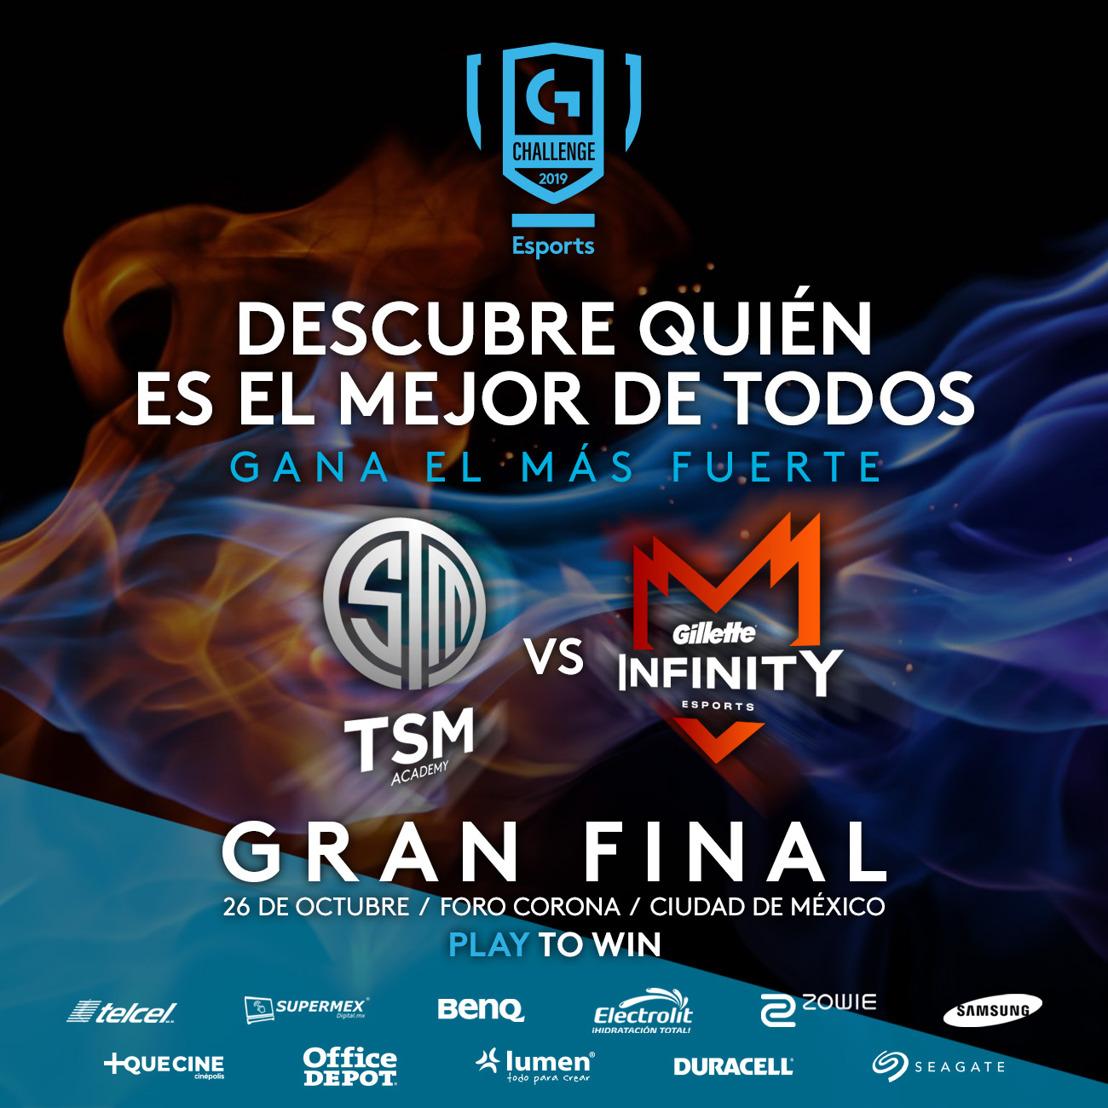 TSM Academy se enfrentará a Gillette Infinity eSports en un showmatch durante Logitech G Challenge 2019